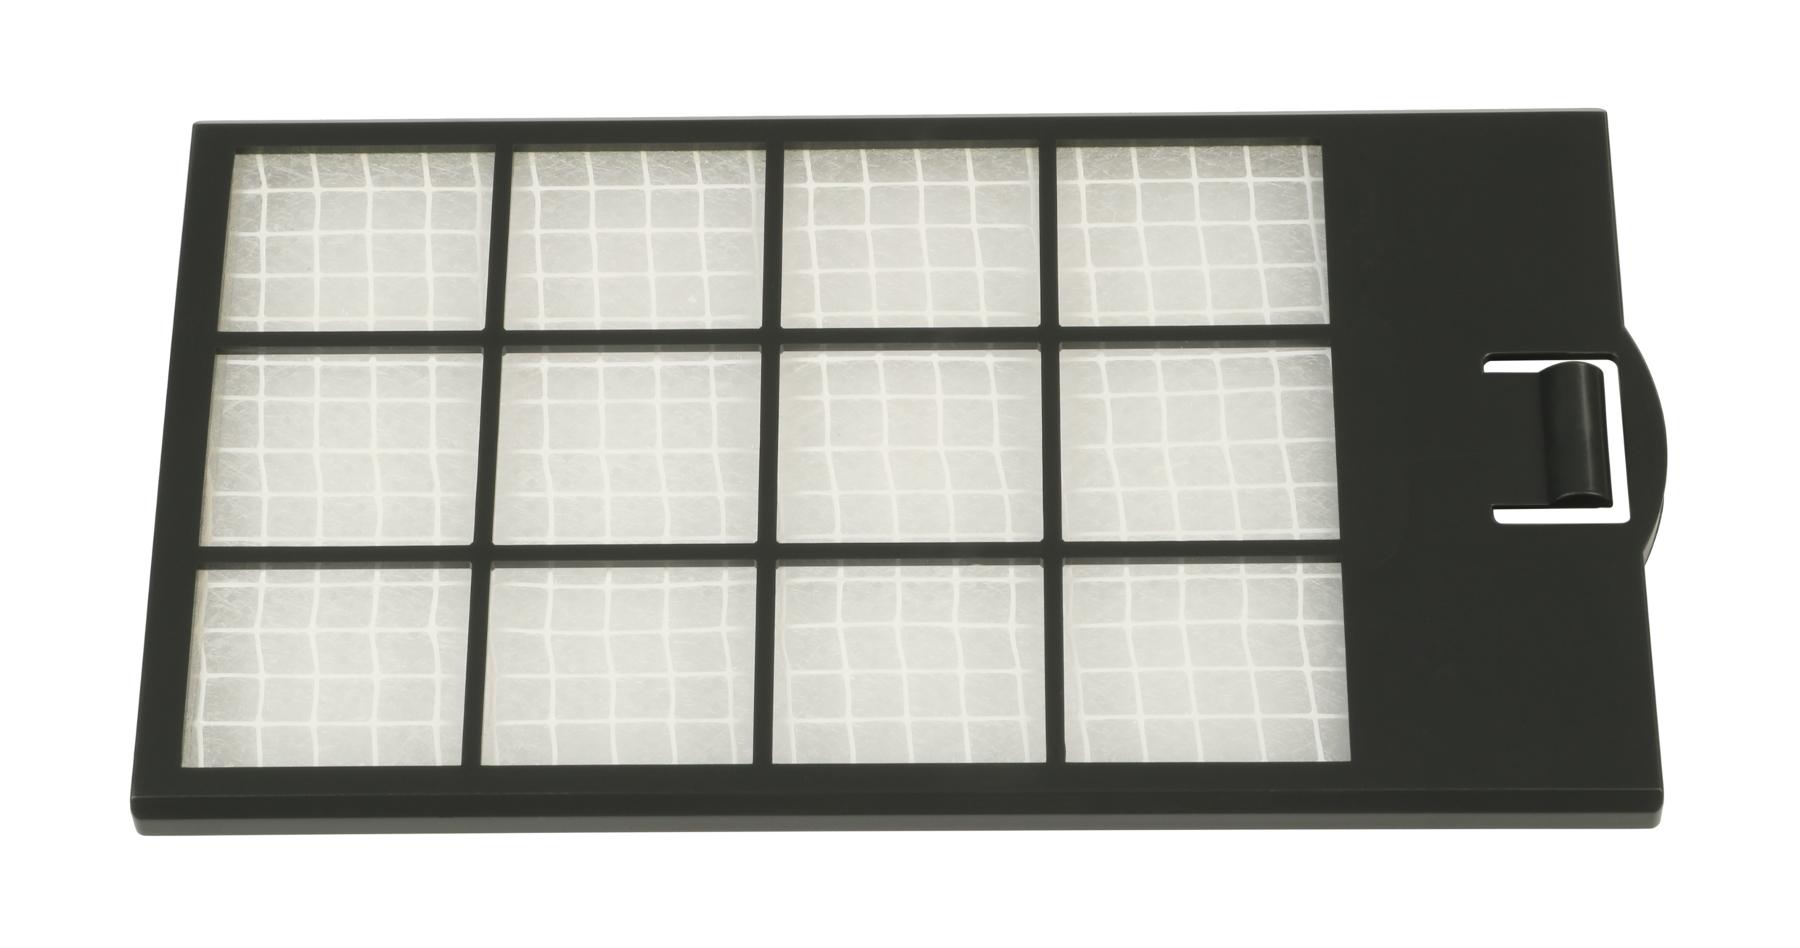 Air Filter for PTD4000U, PTD5600U, and PTDW5100U